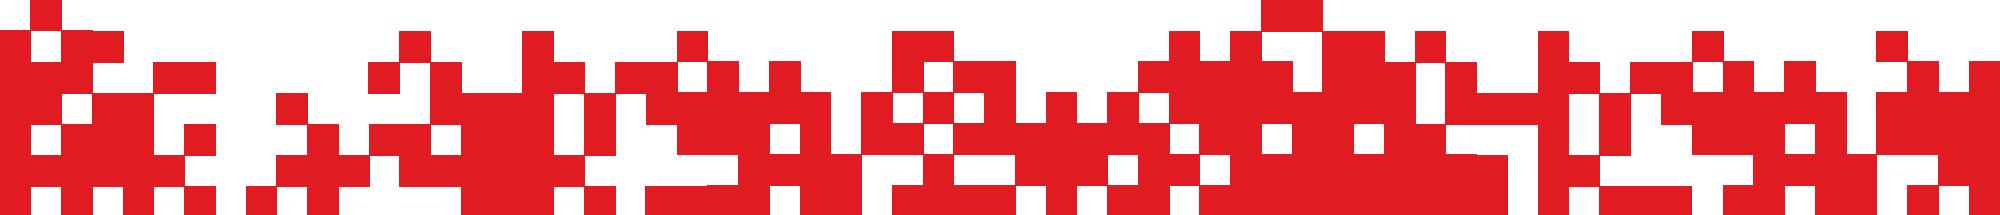 launch_redpattern_bottom